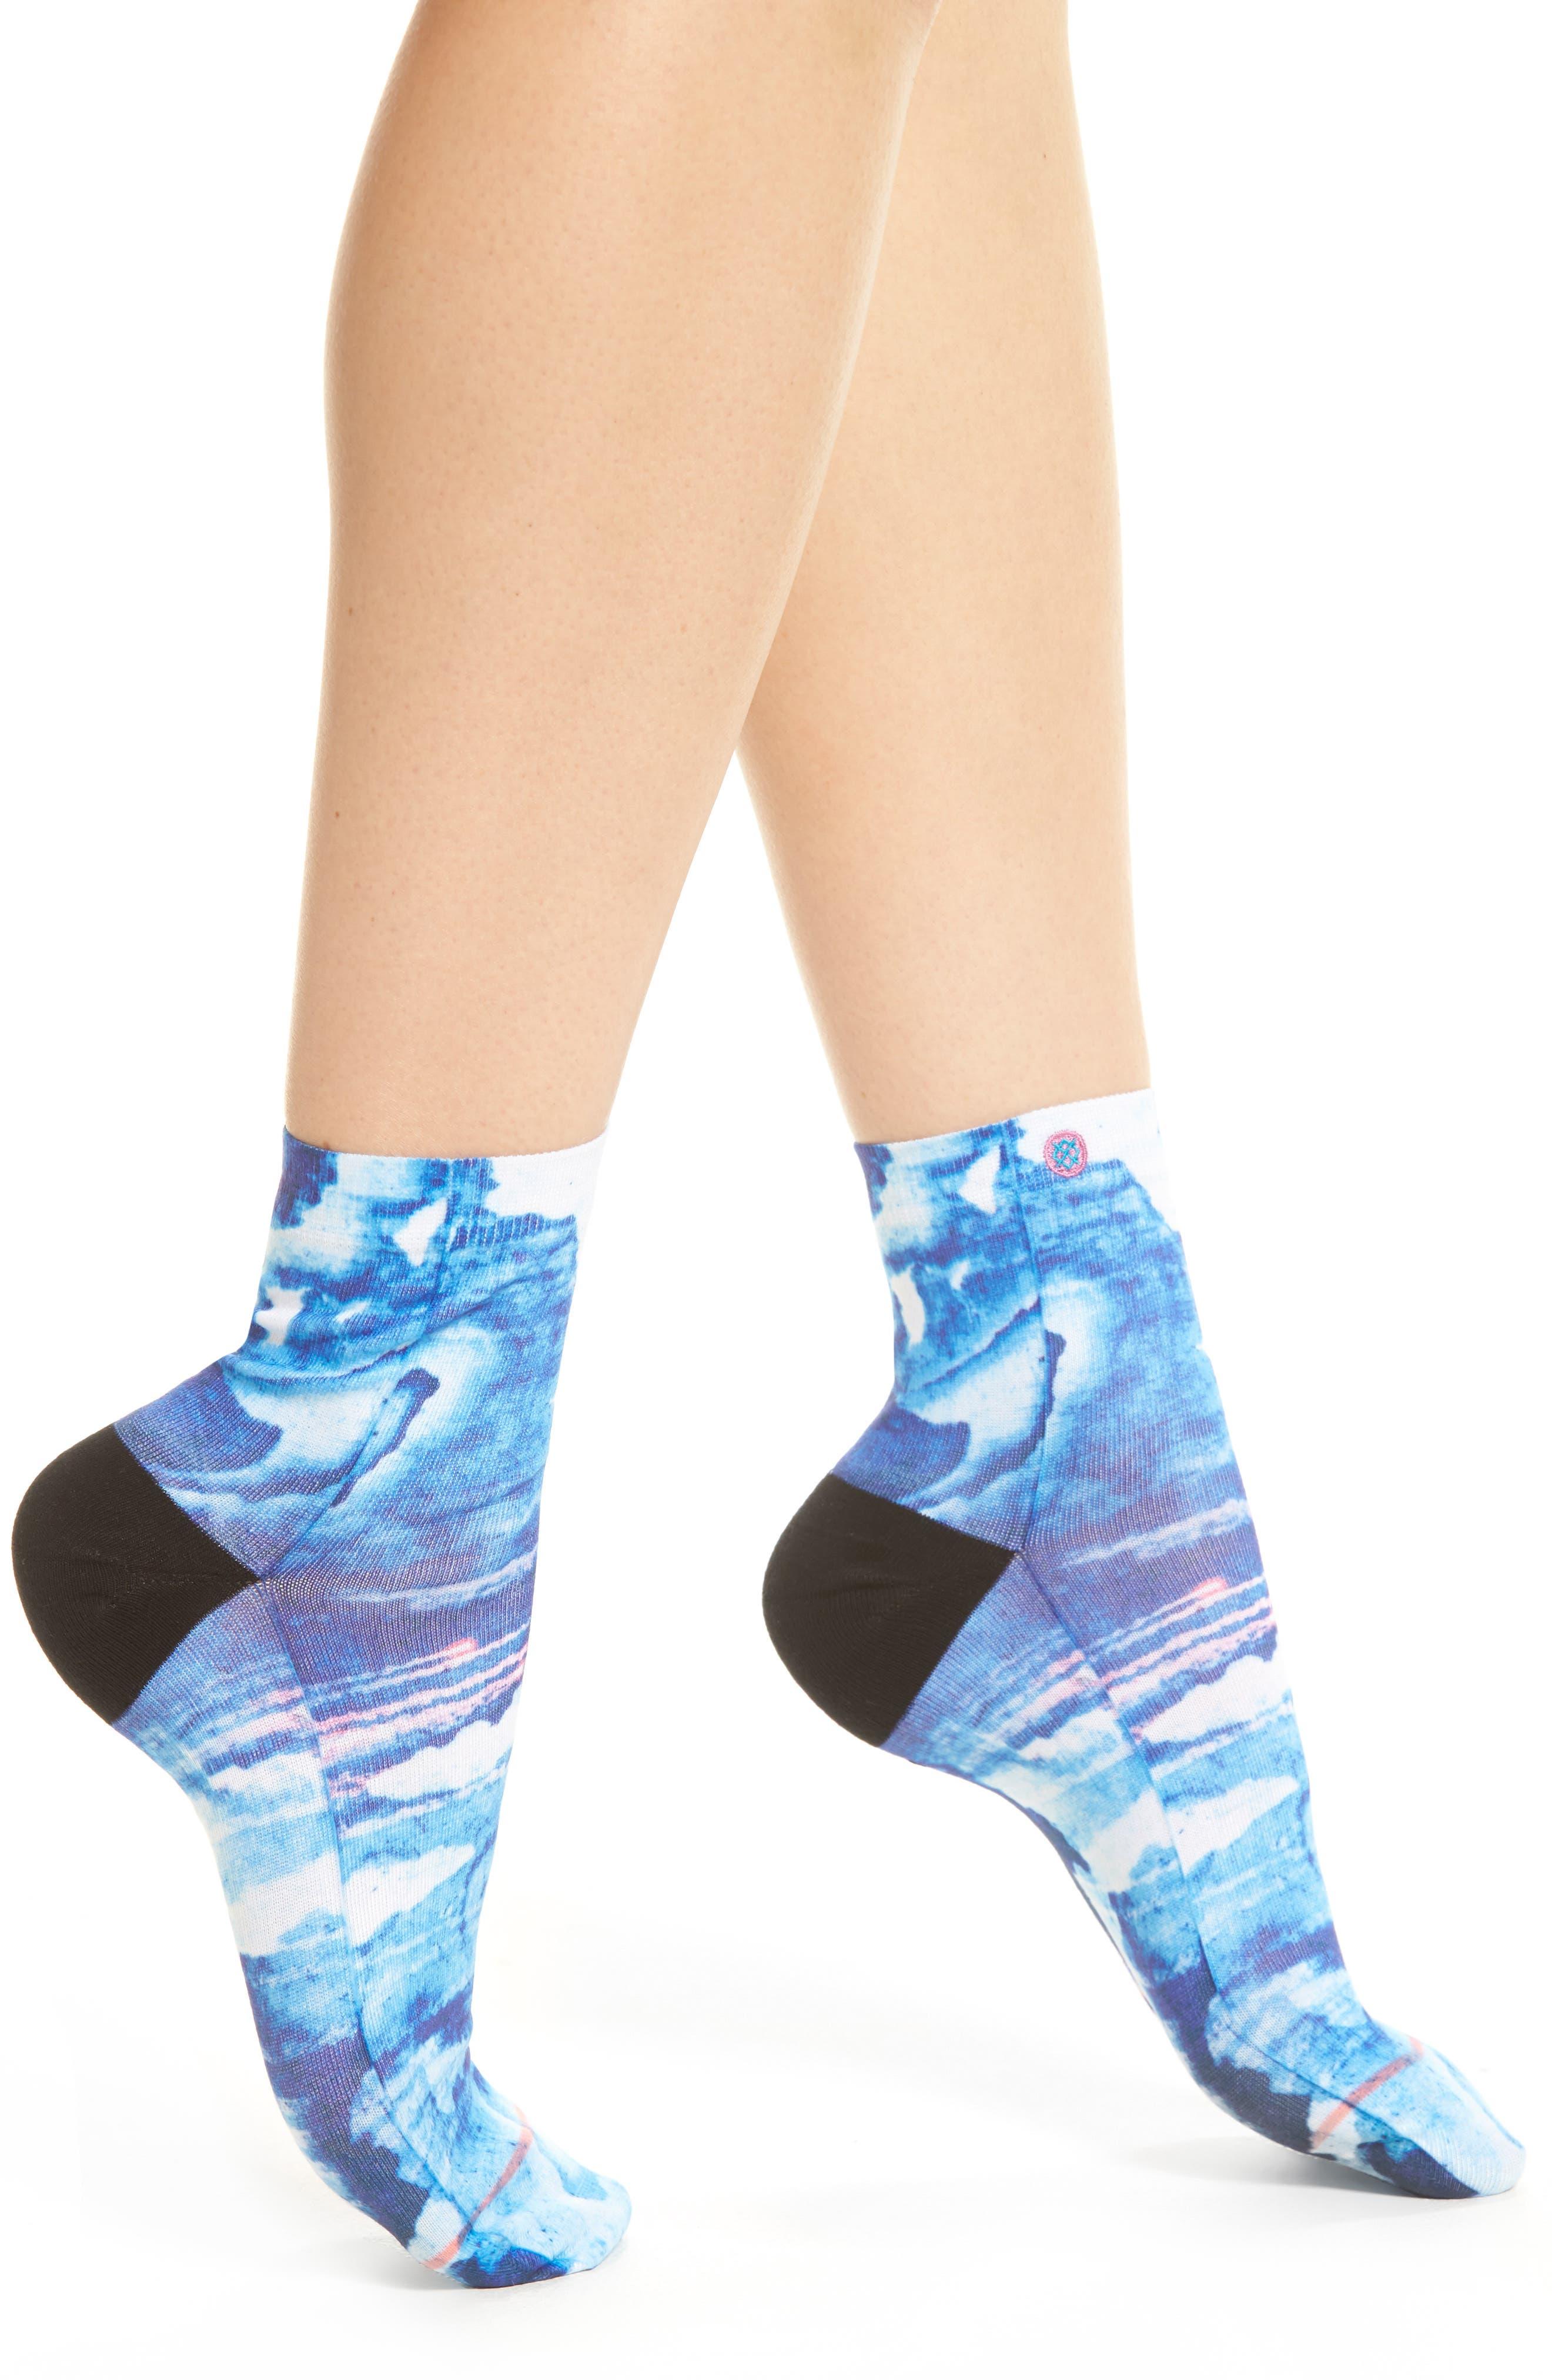 Tropic Storm Ankle Socks,                             Main thumbnail 1, color,                             400